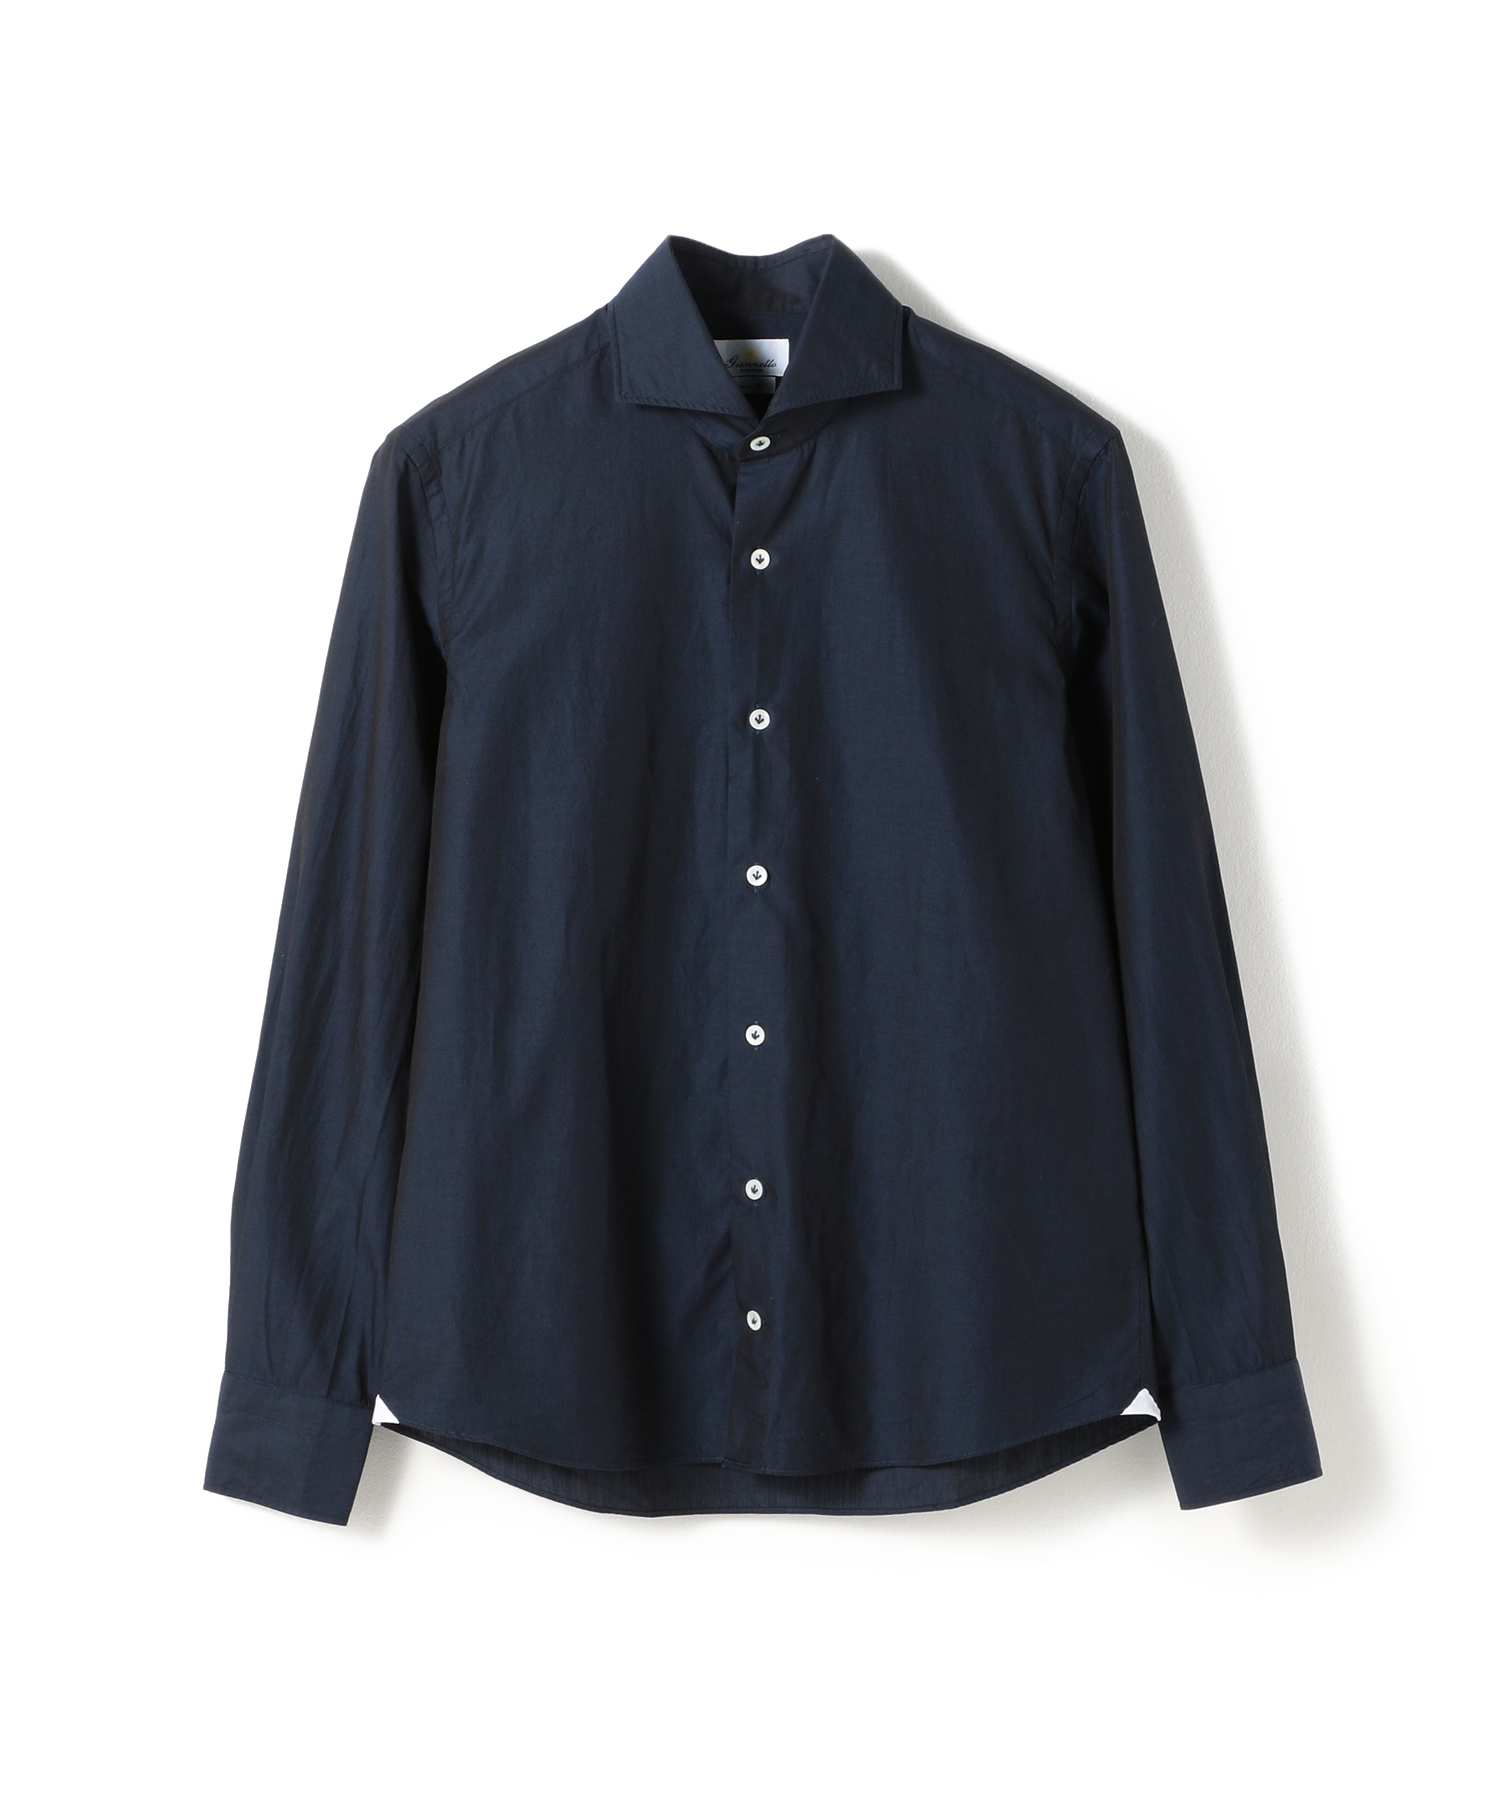 GIANNETTO / カラーシャンブレーシャツ